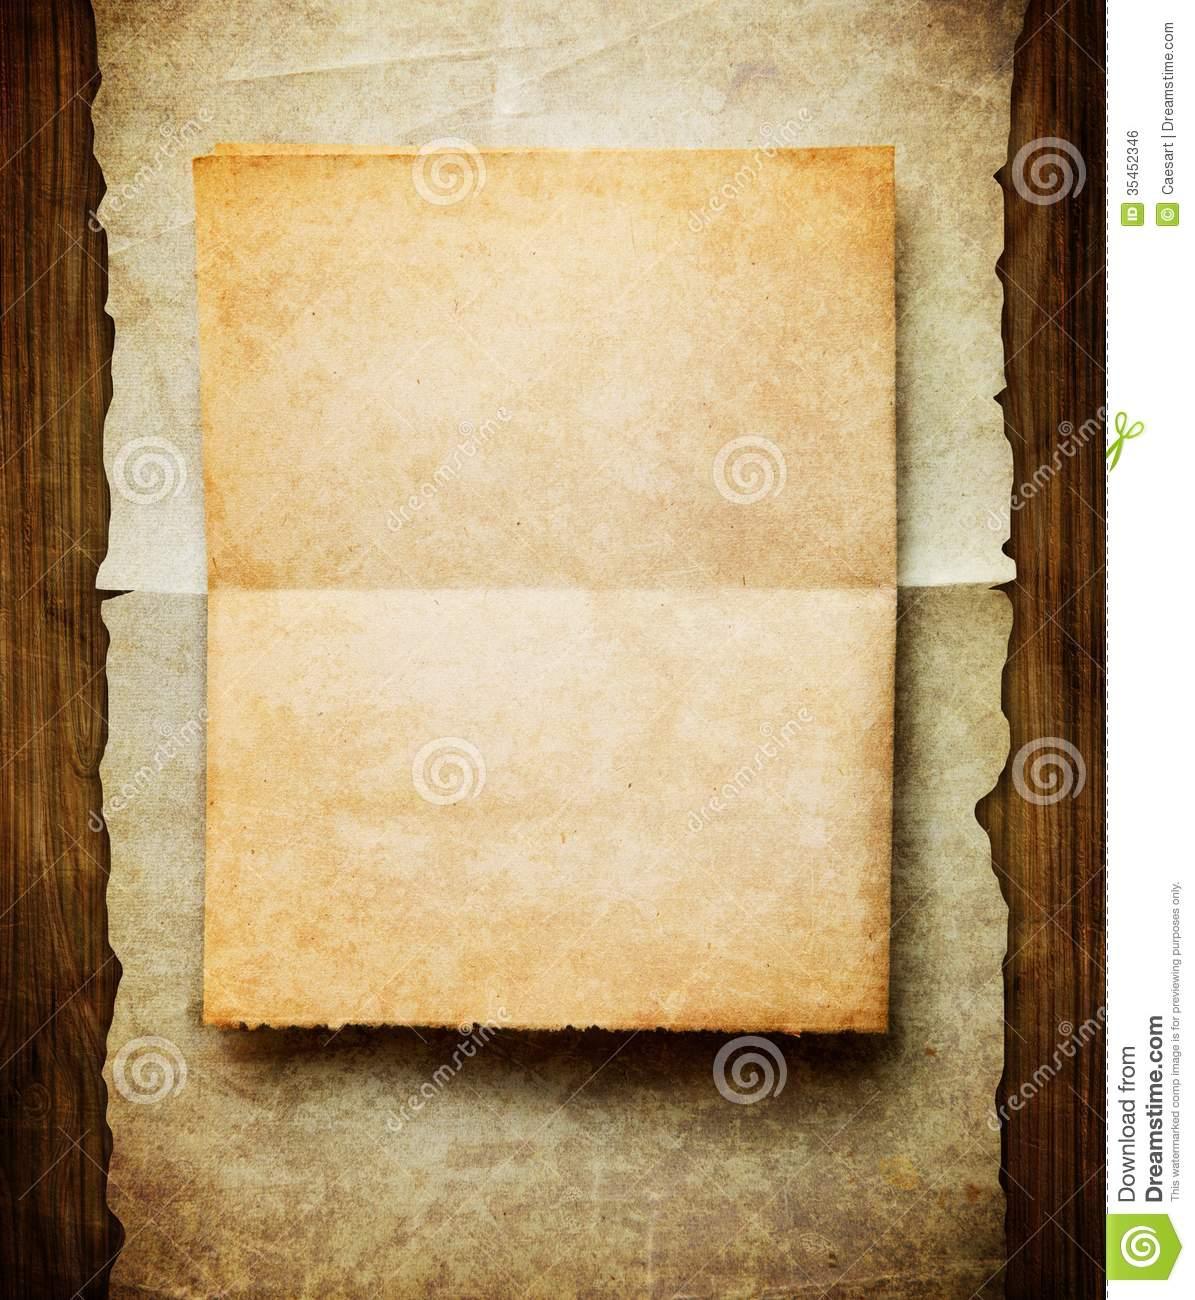 30 Old Paper Textures - t 1